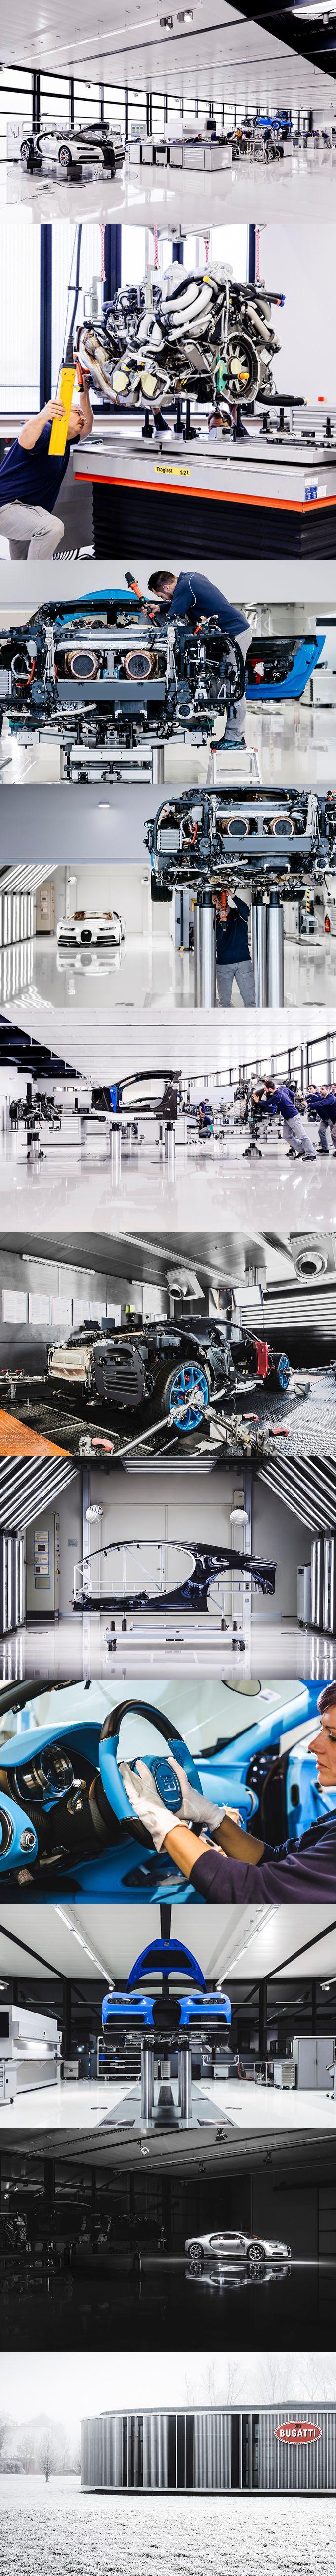 2017 Bugatti Chiron prouction / 1479hp 8.0l W16 / Molsheim France / blue white